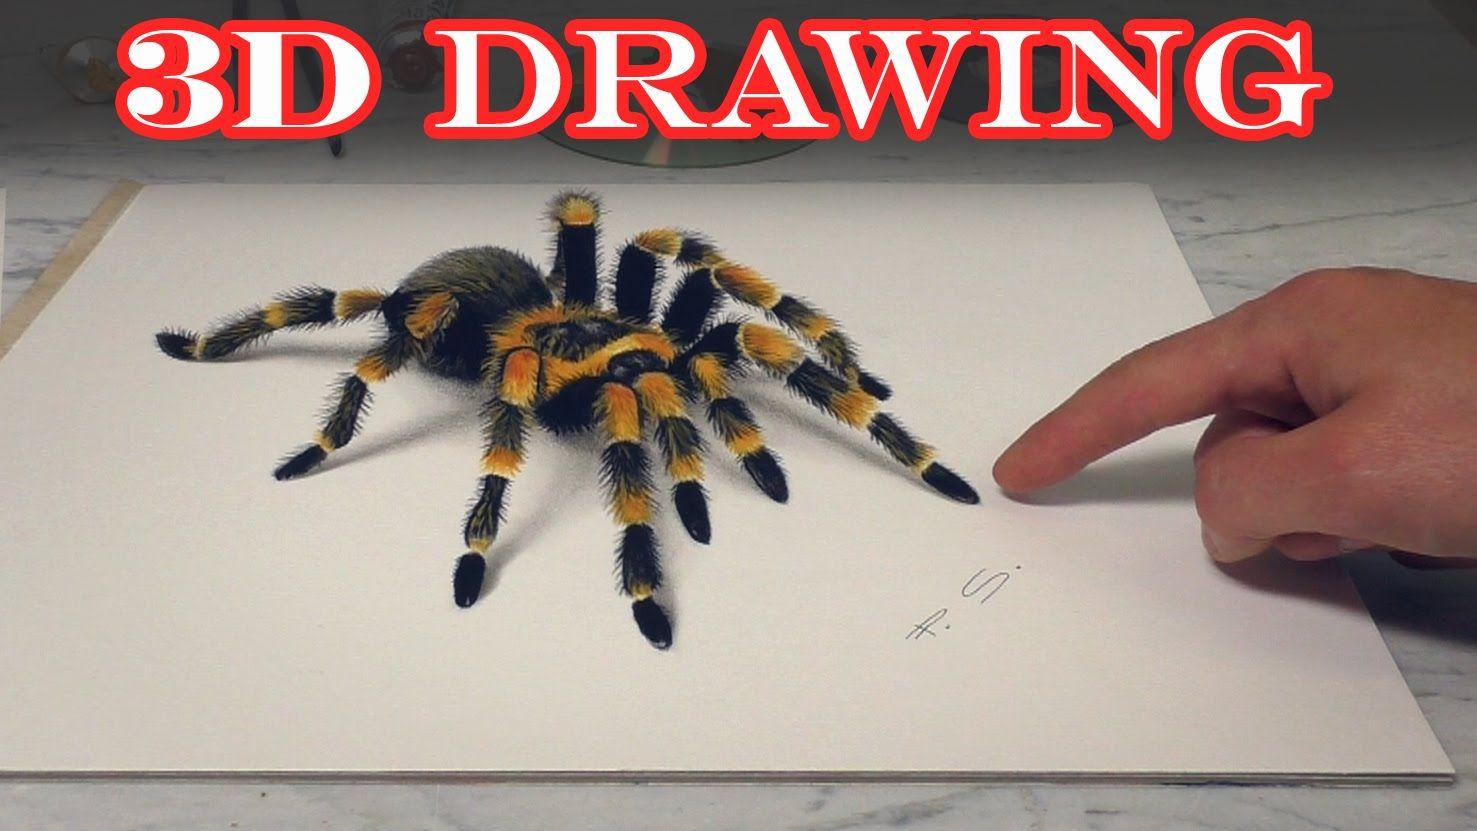 Spider 3D Drawing/Amazing terrible Trick Art/ dibujar bien tarantula ...